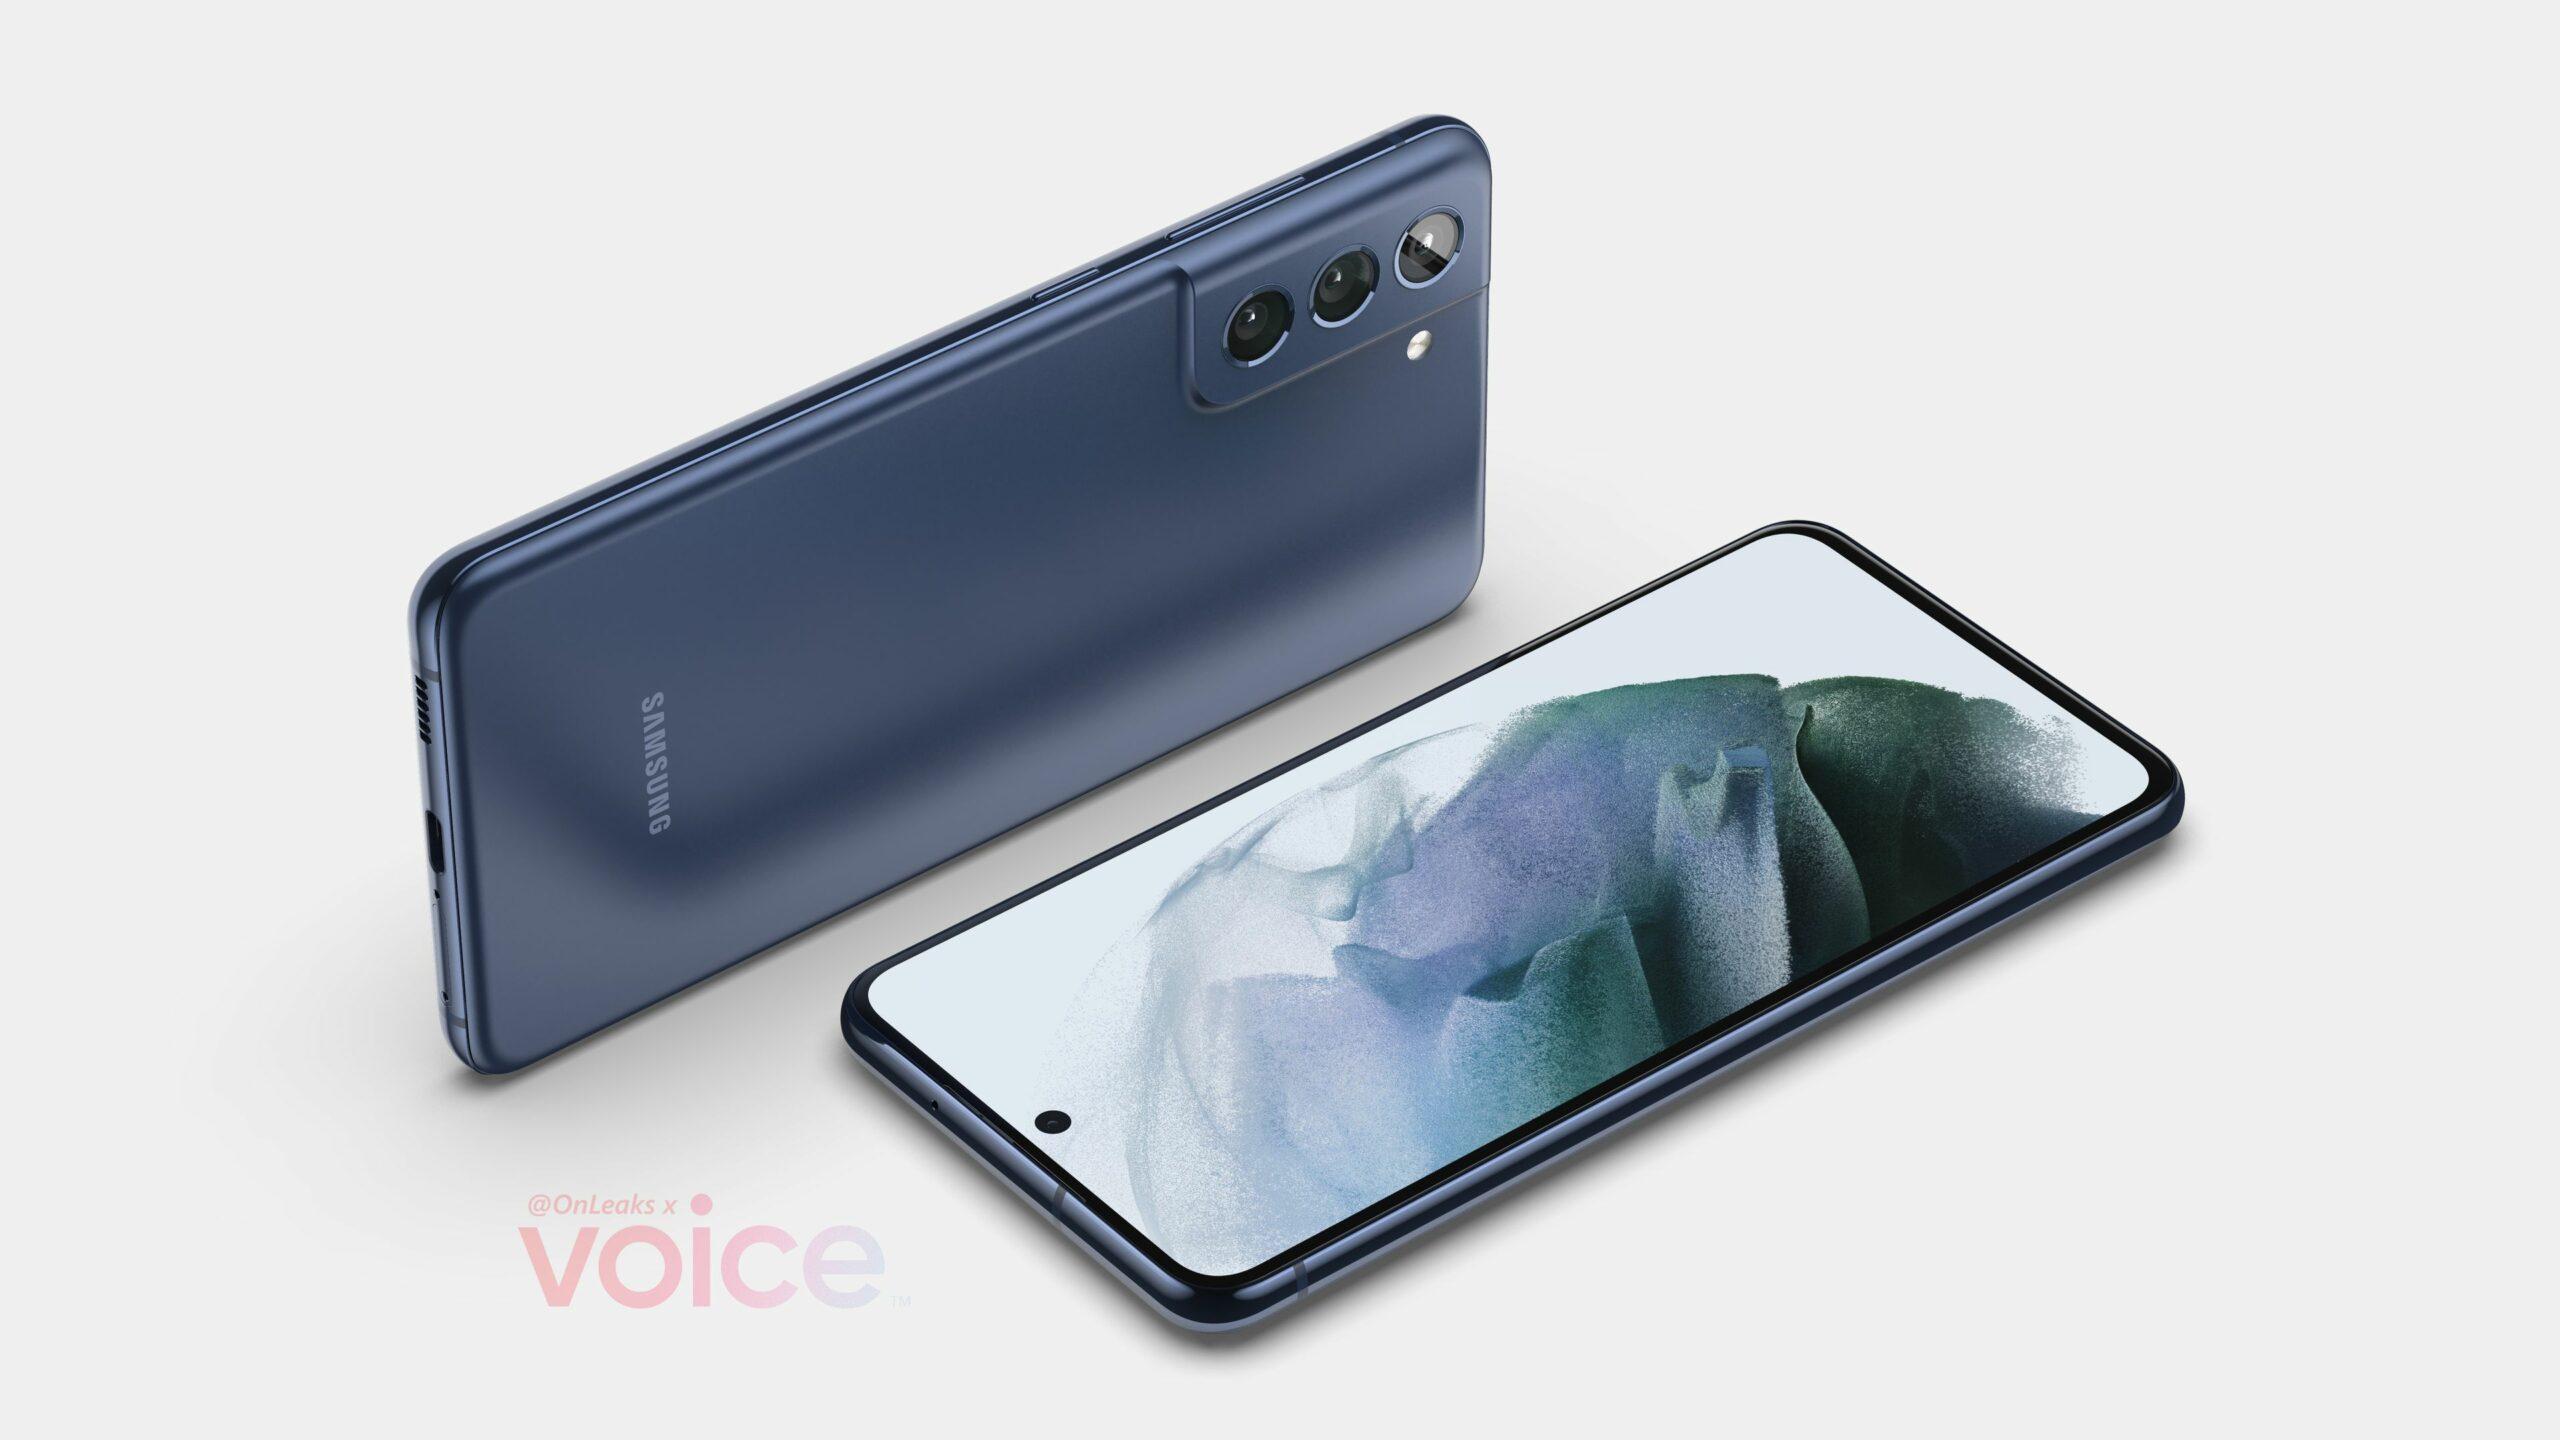 Samsung Galaxy S21 FE showcased through renders